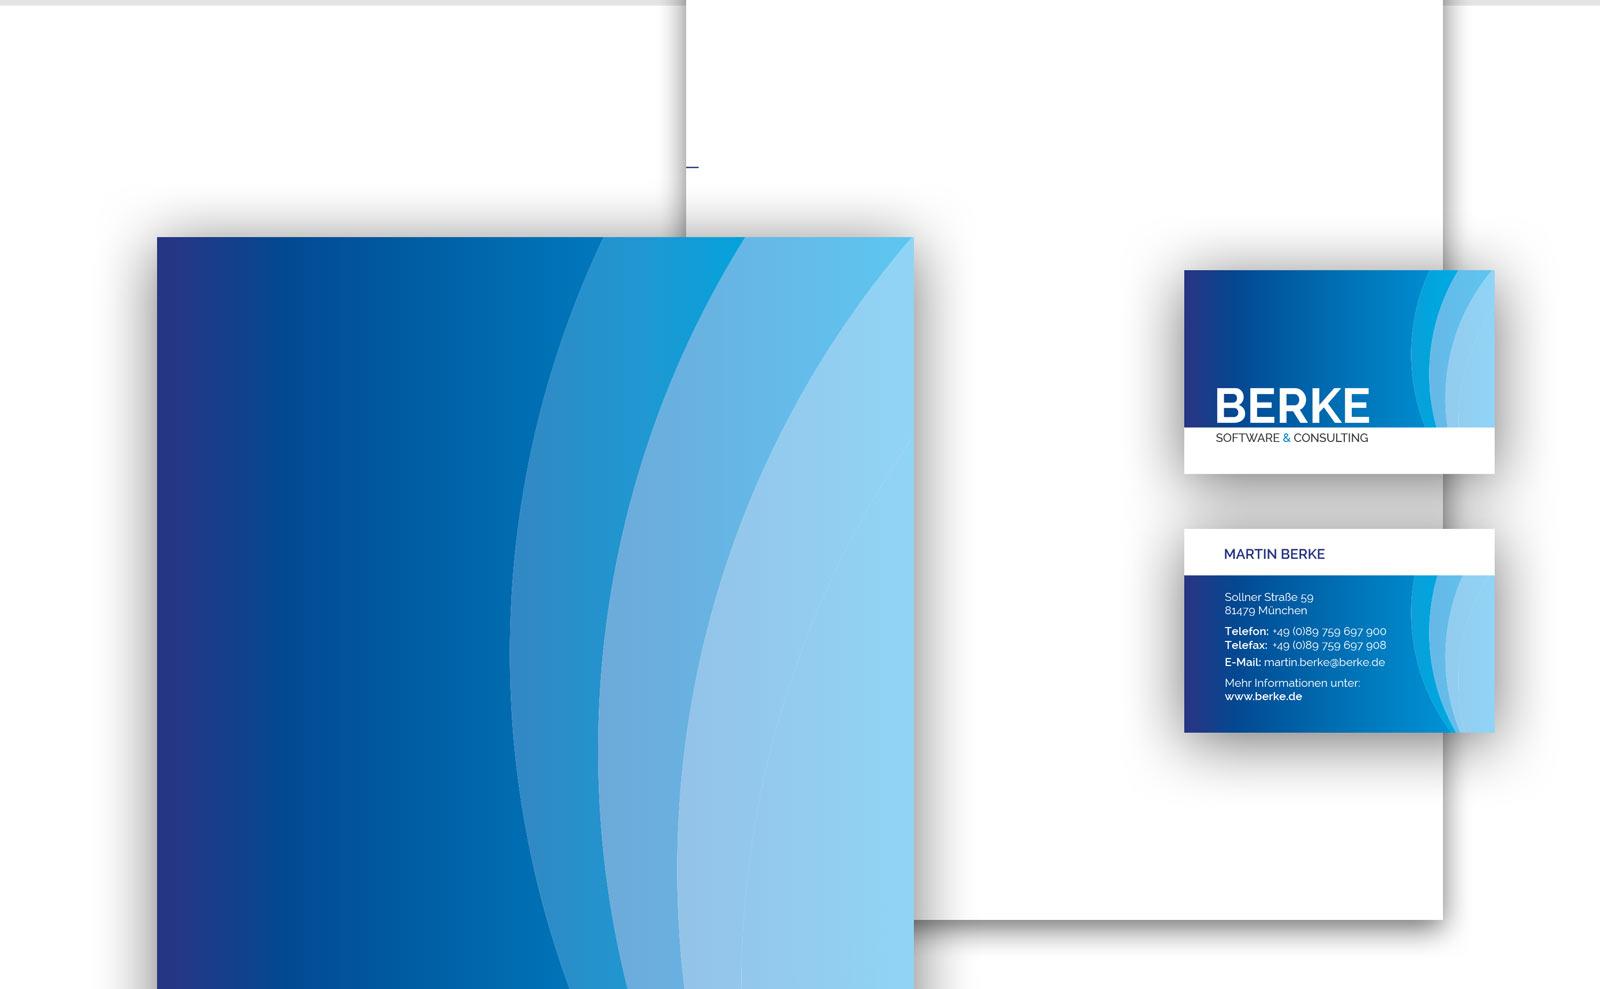 Berke_IT_Corporate_Design_Visitenkarten_Briefpapier_4.jpg